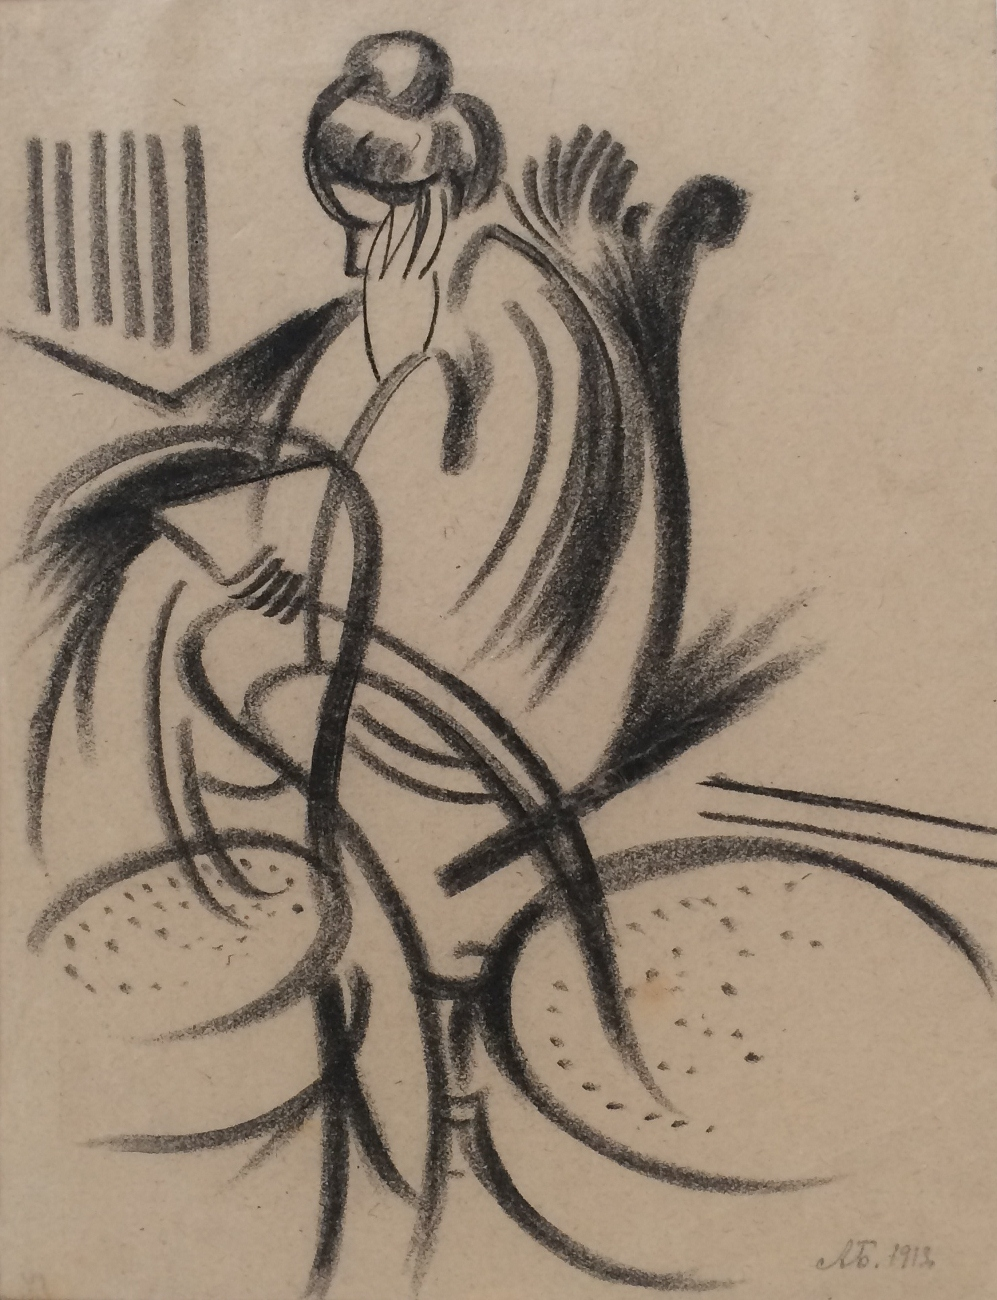 Seated woman reading (Wanda), 1913 - Alexander Bogomazov